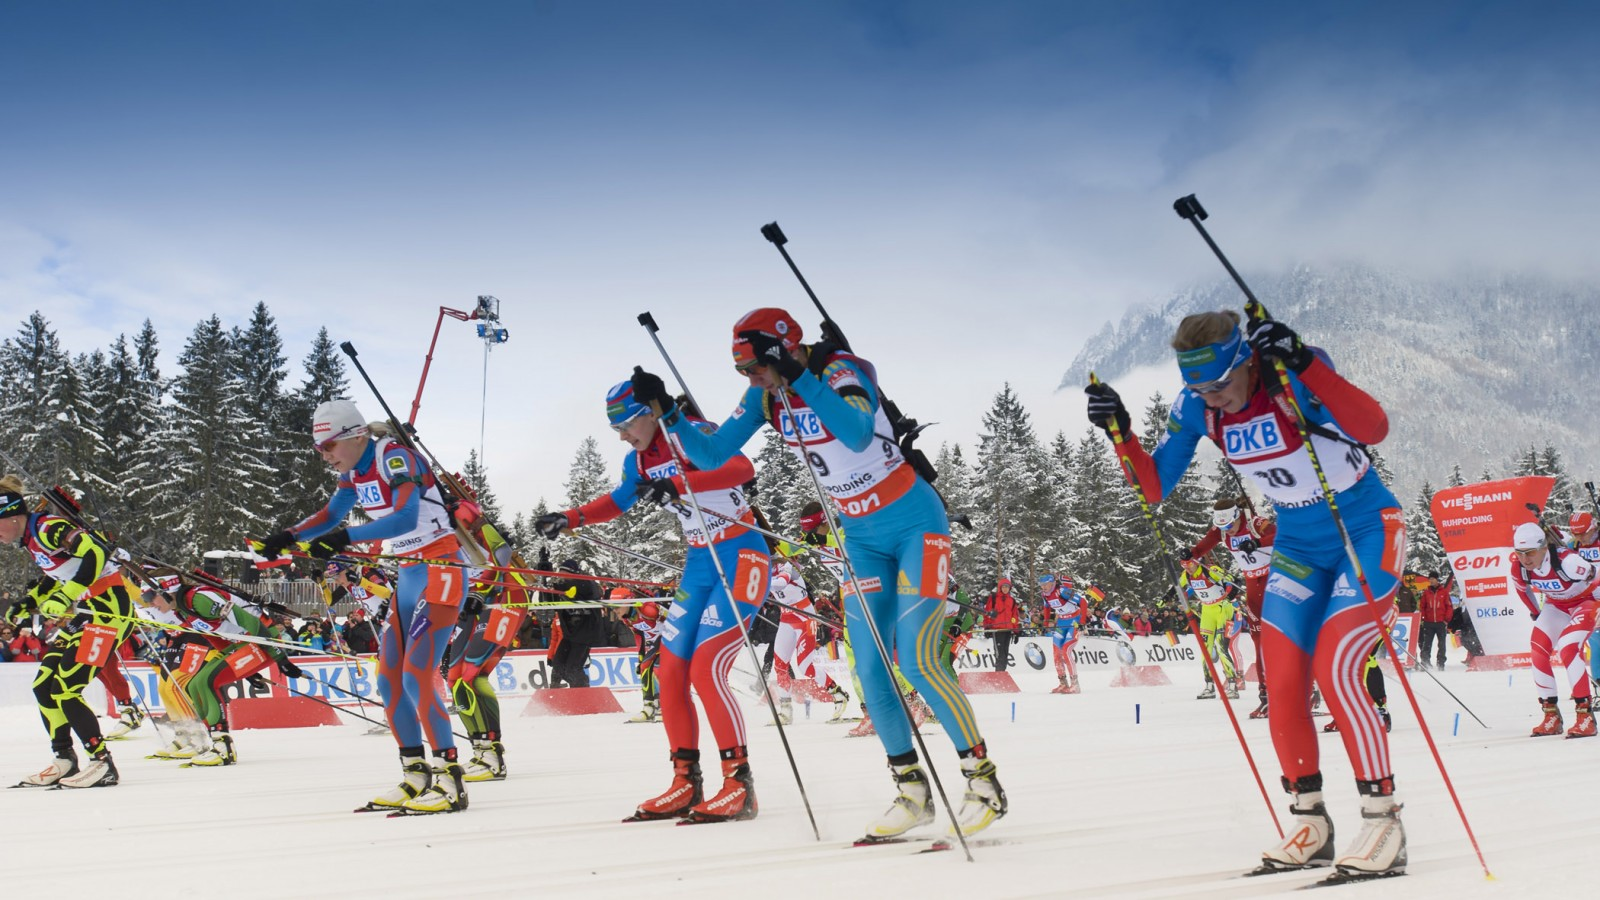 HELDs Vitalhotel | IBU Biathlon Welt Cup